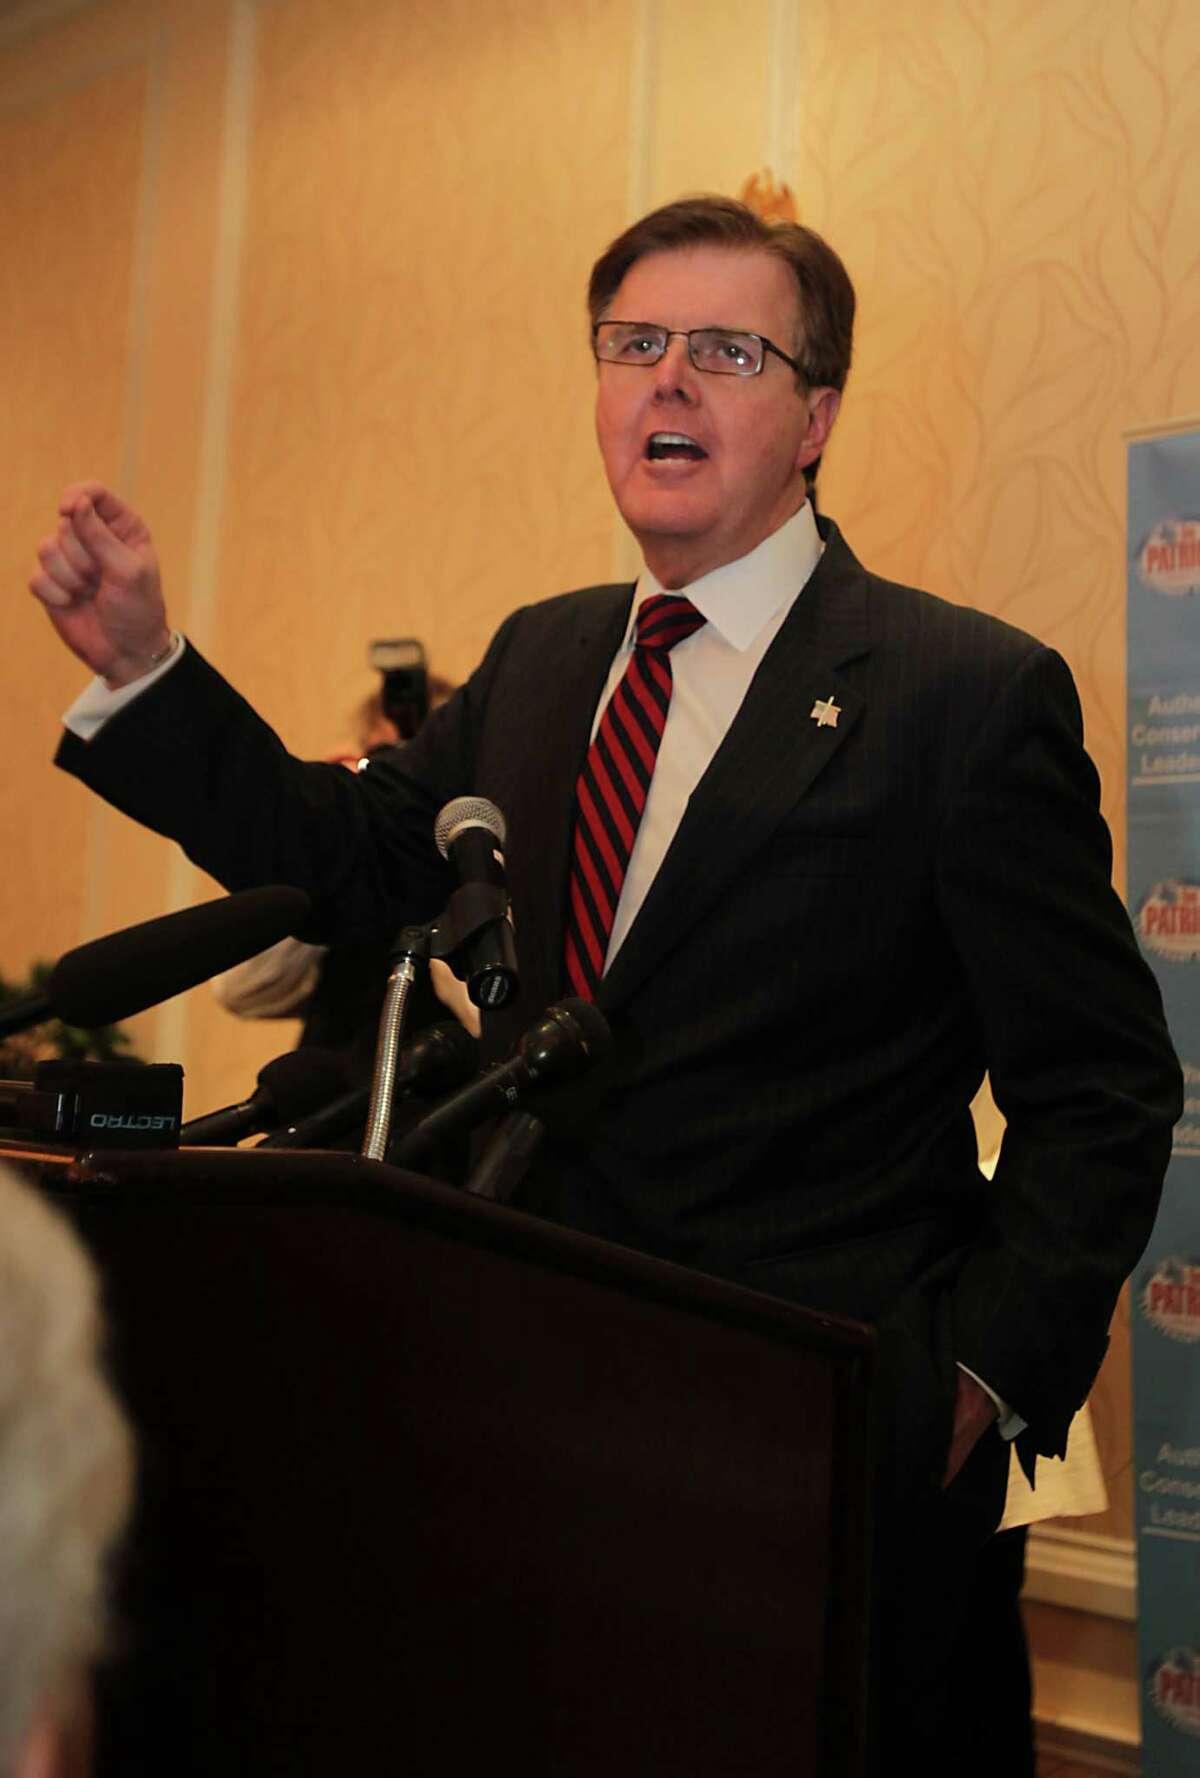 State Sen. Dan Patrick, above, will meet Lt. Gov. David Dewhurts in a Republican runoff on May 27.